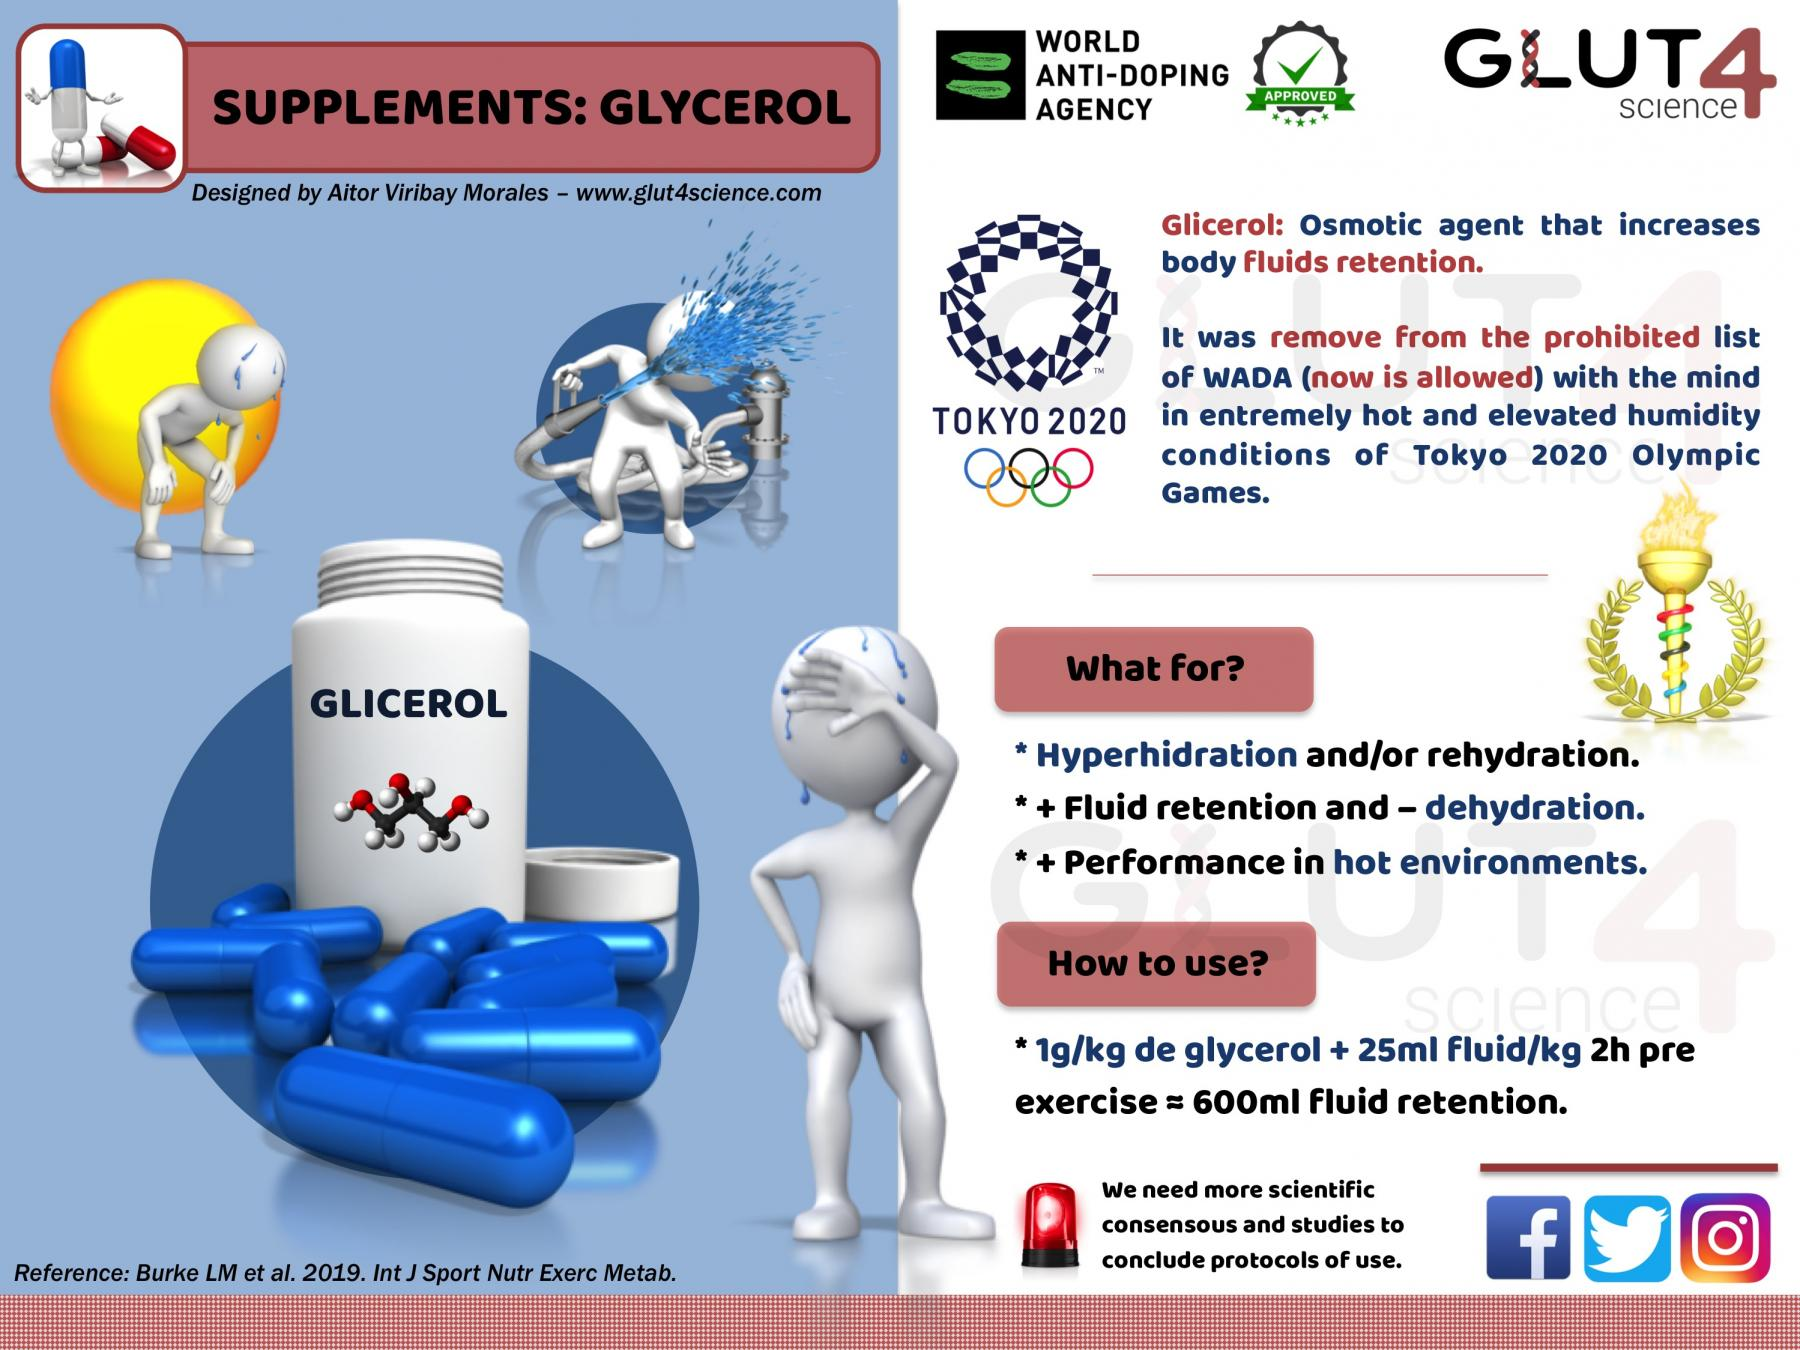 Glycerol: Osmotic agent in sport - hyperhidration